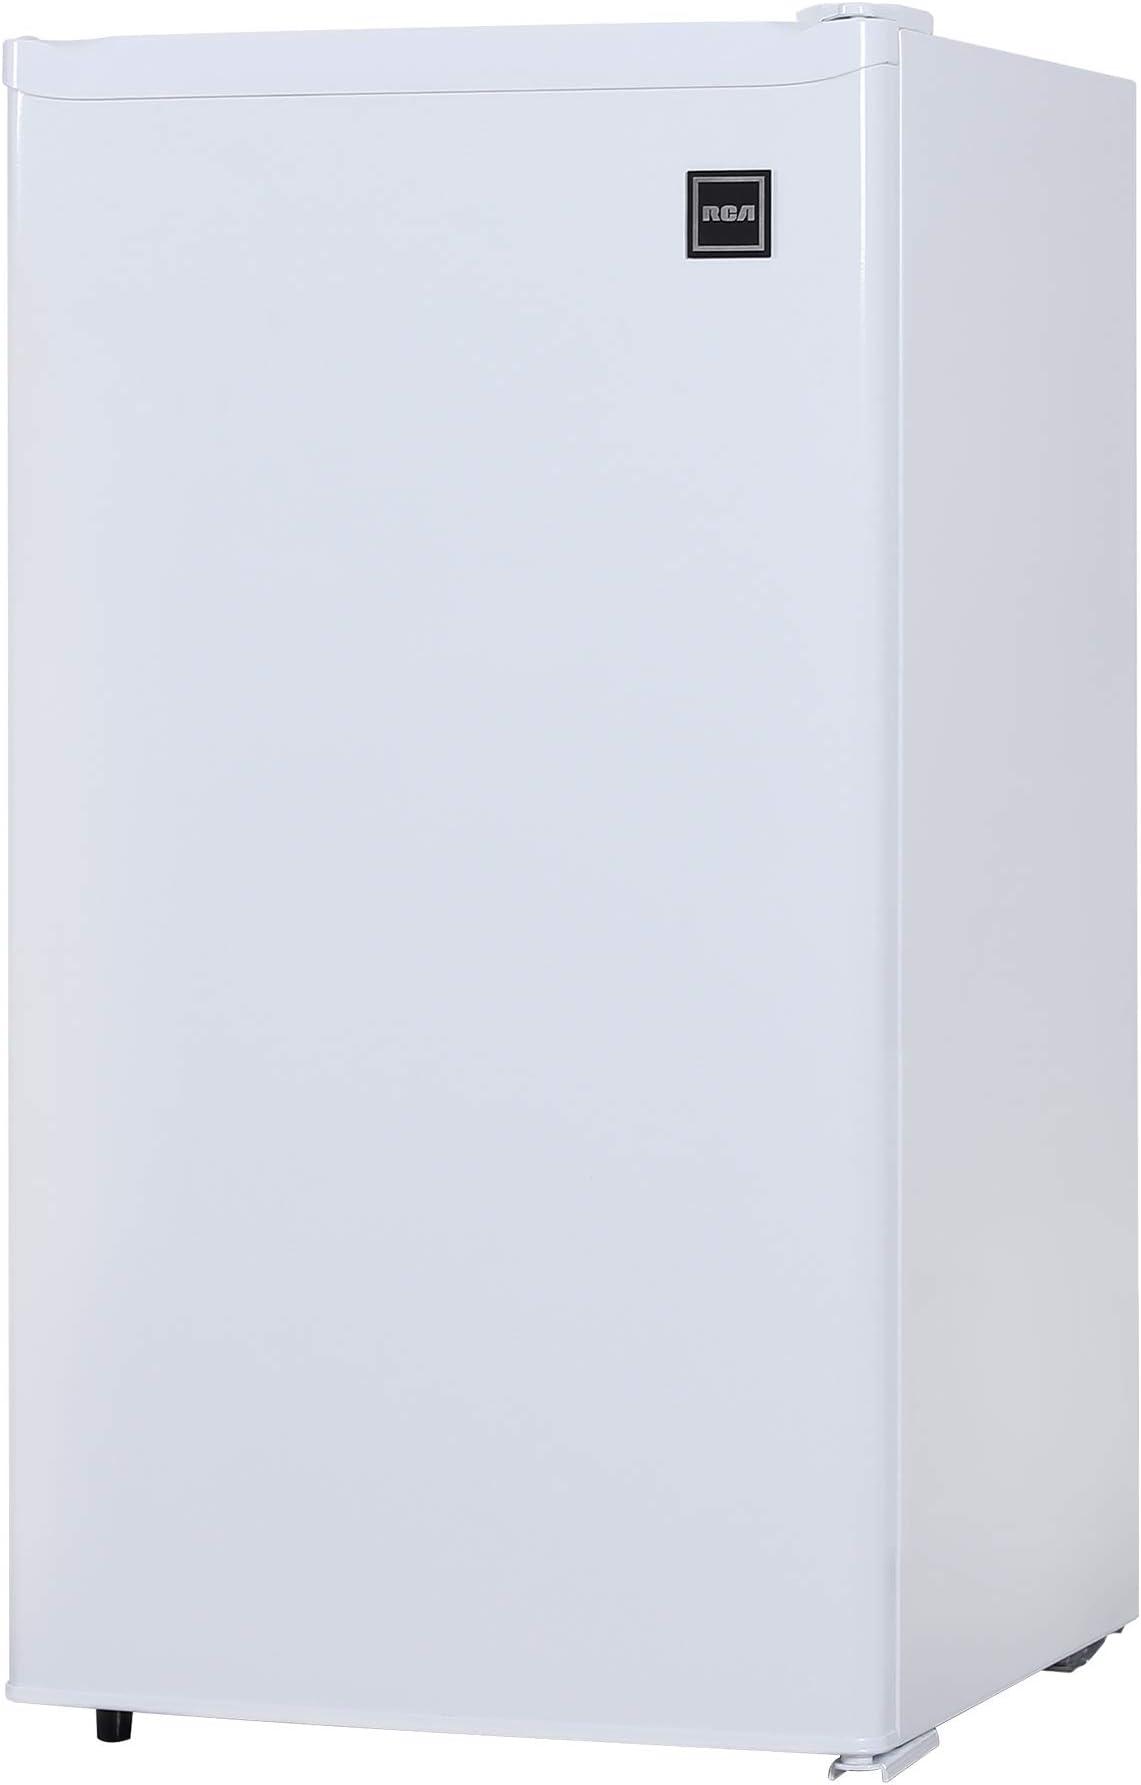 RCA RFR321-FR320/8 IGLOO Mini Refrigerator, 3.2 Cu Ft Fridge, White